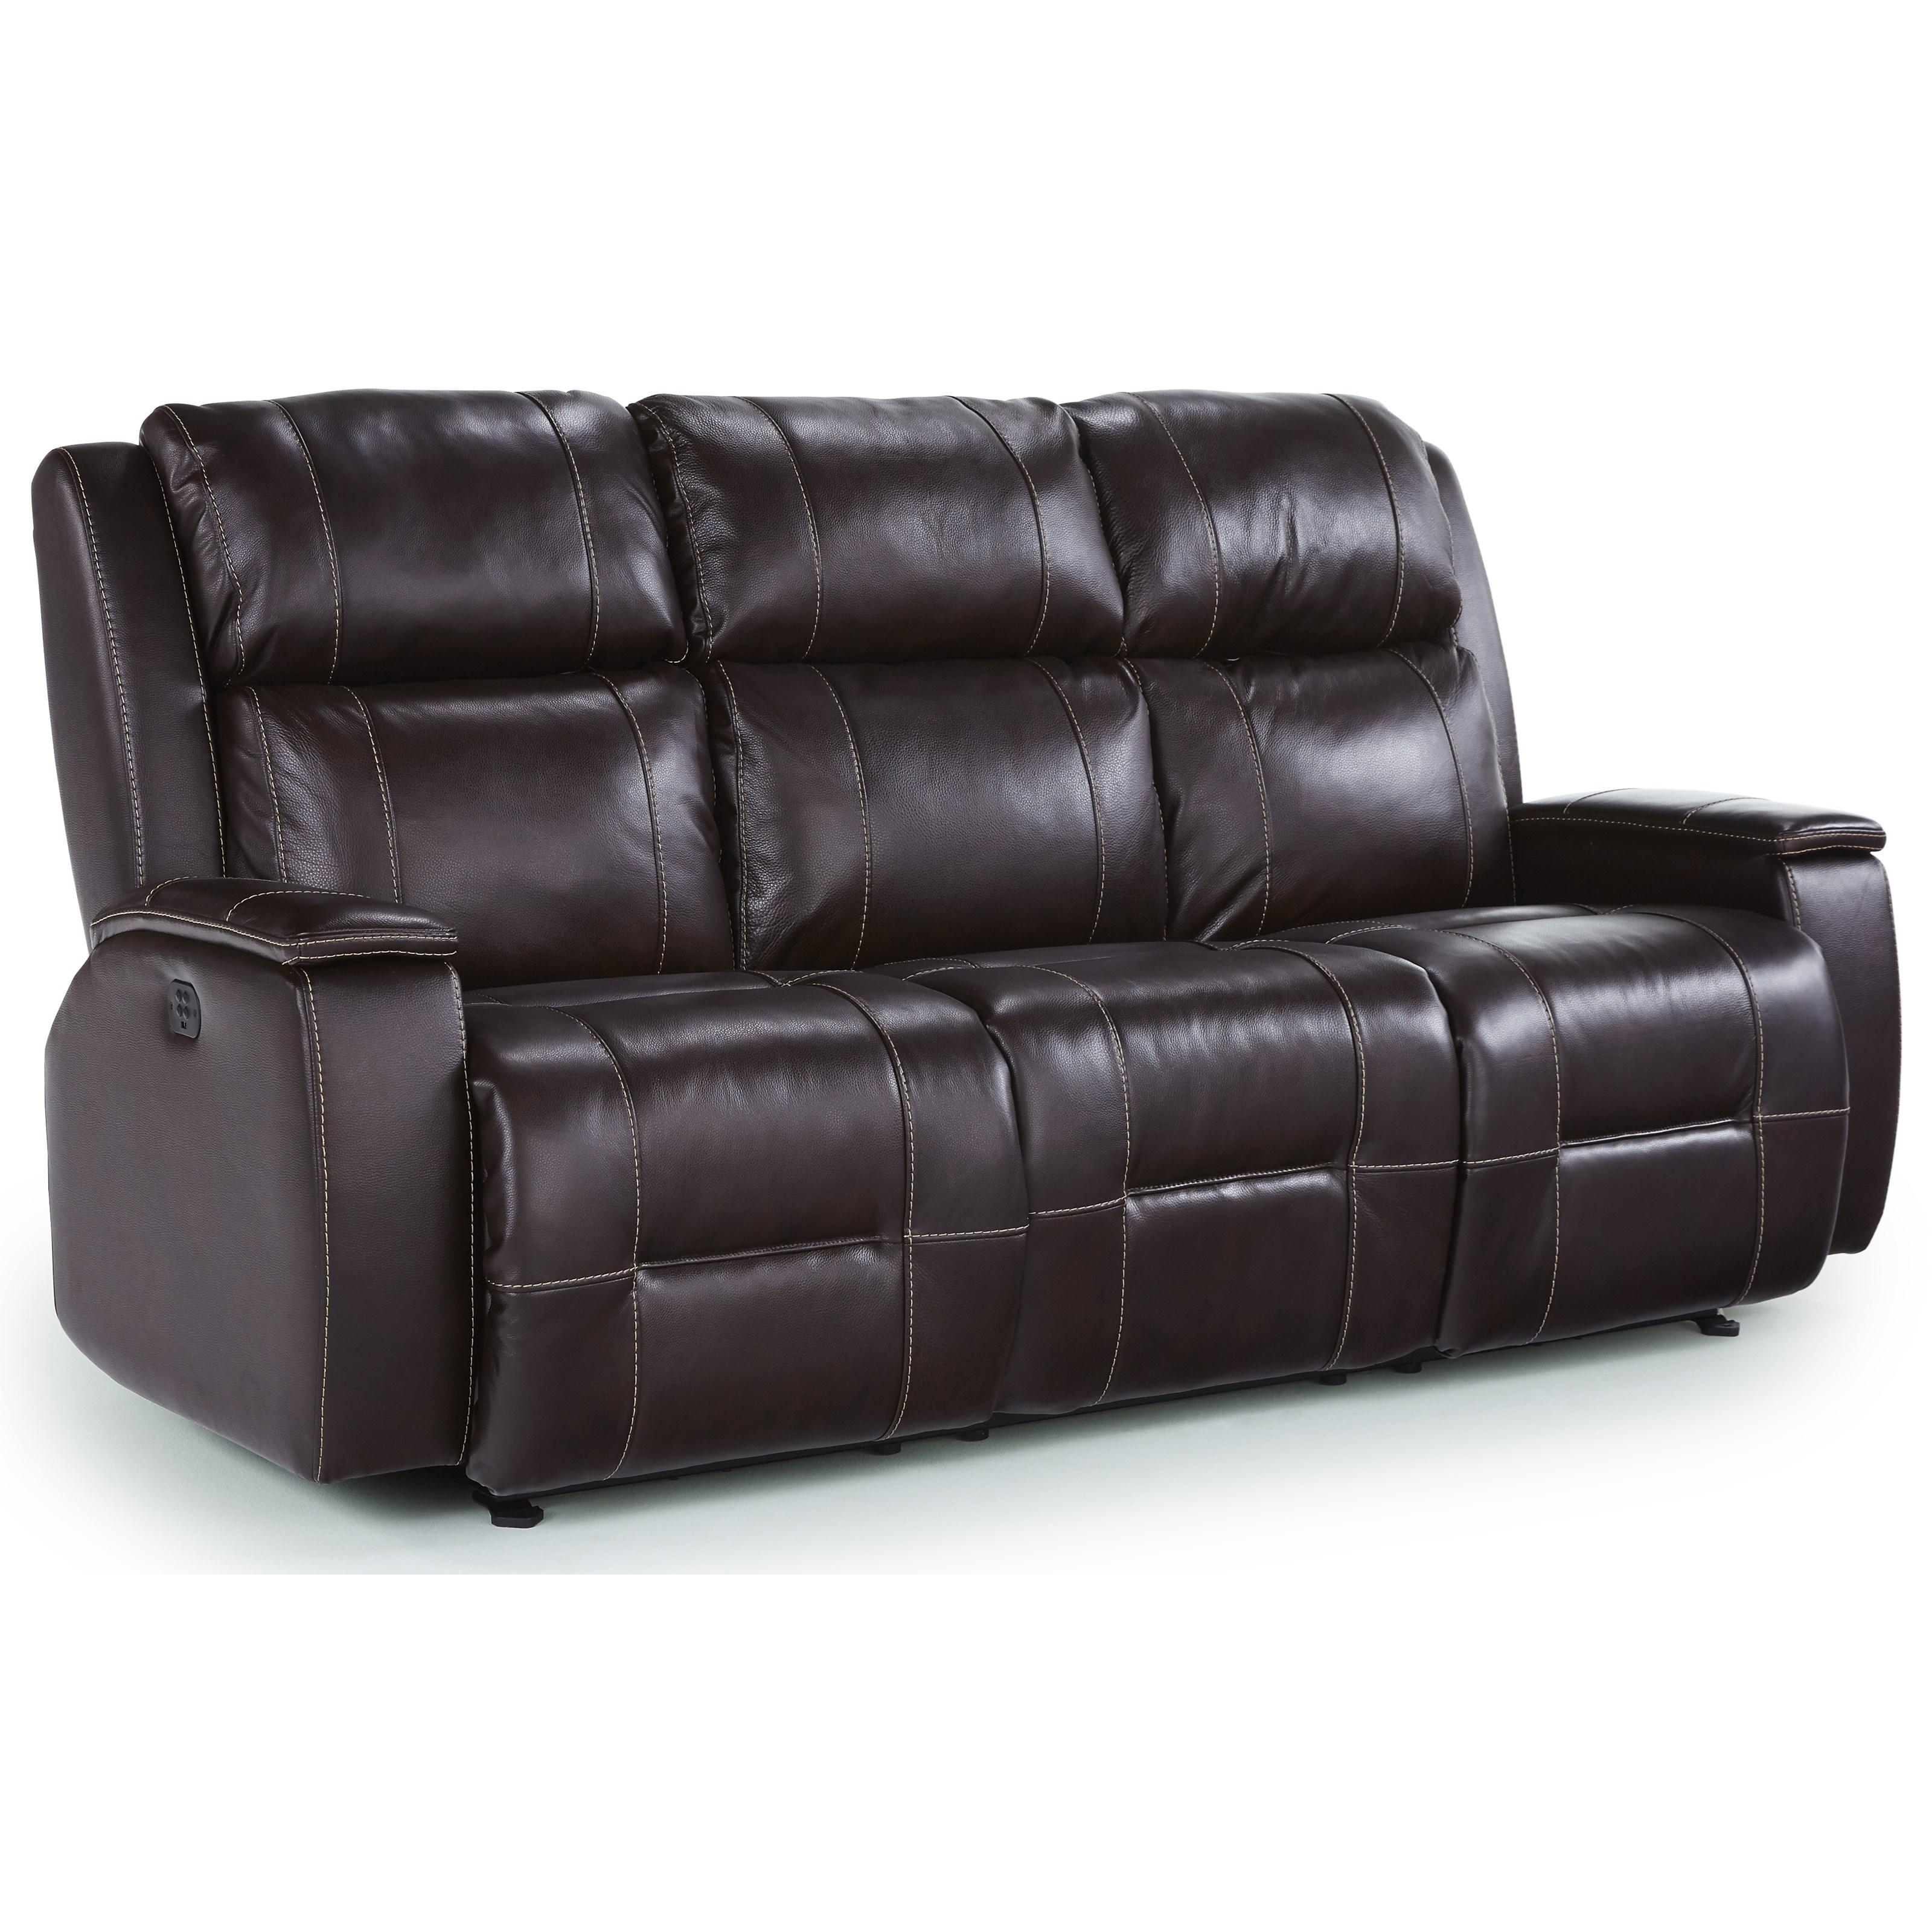 Best Home Furnishings Colton Power Walhugger Recl Sofa w/ Pwr Headrest - Item Number: S740CZ4-73226